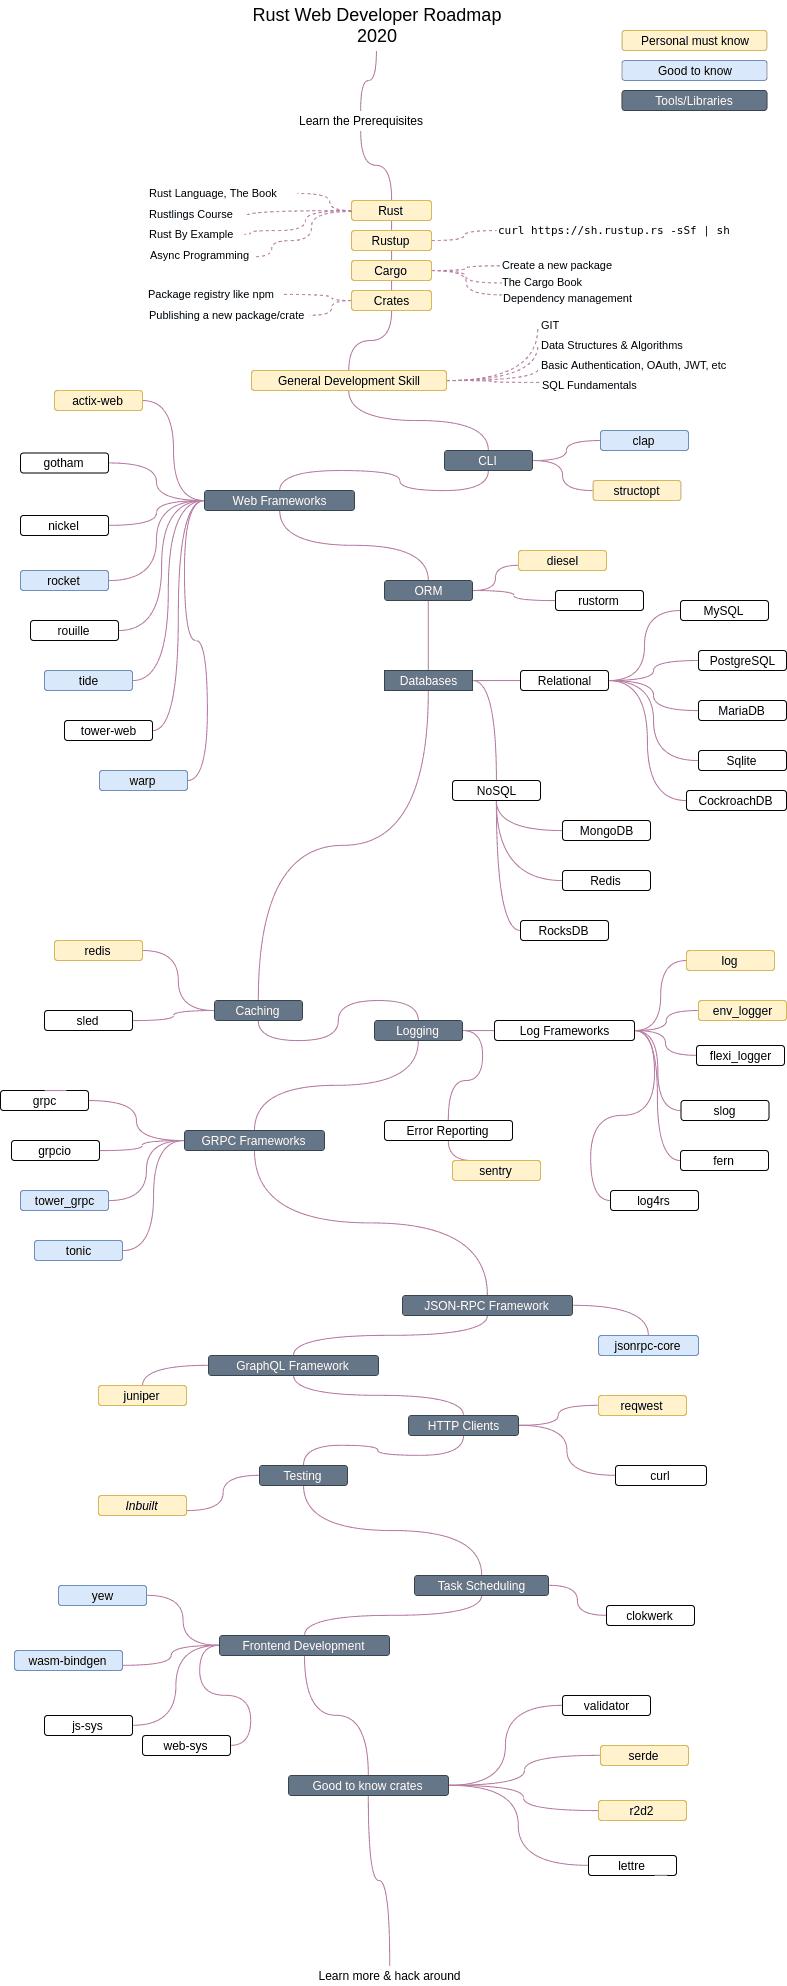 Rust Developer Roadmap 2020